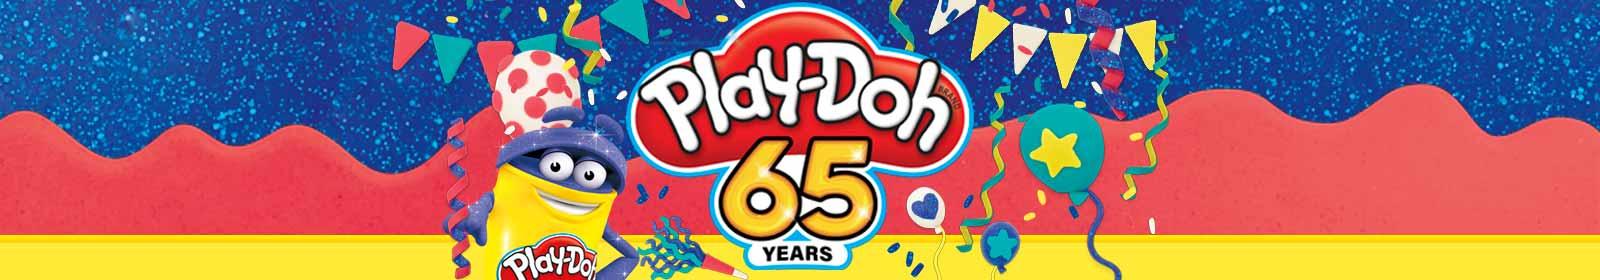 pt-banner header play doht